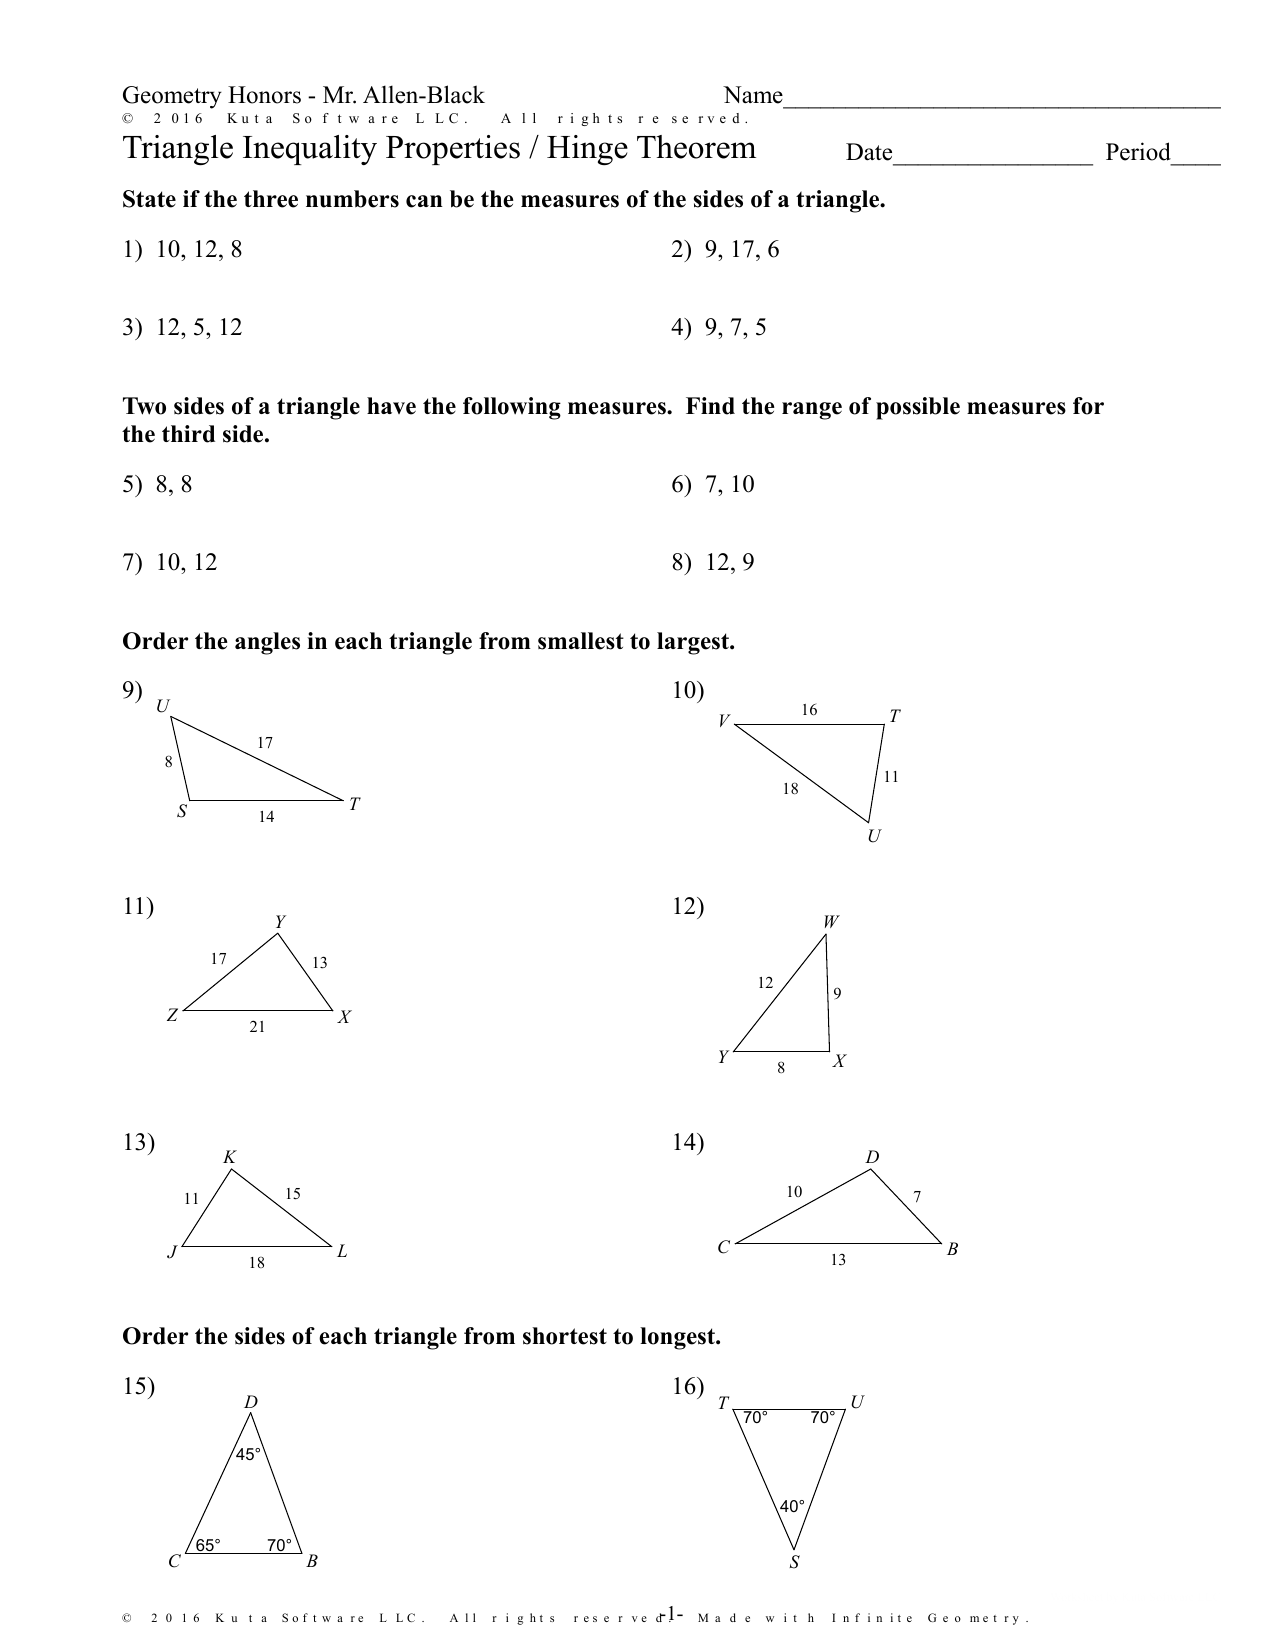 Triangle Inequality Properties / Hinge Theorem Intended For Triangle Inequality Theorem Worksheet